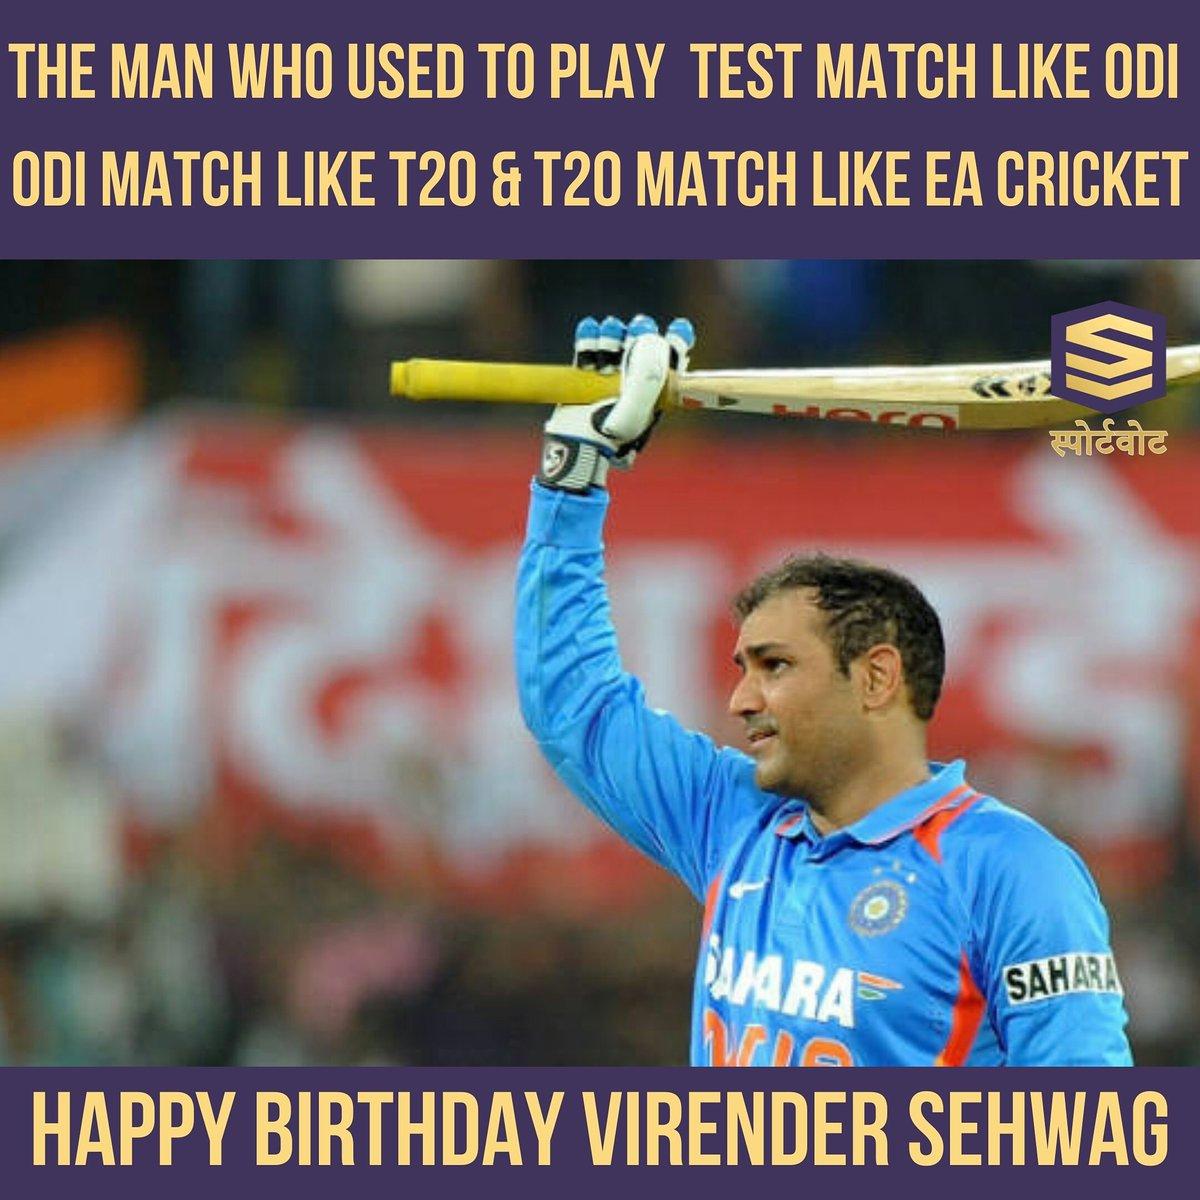 Happy Birthday @virendersehwag @sportvot #virendersehwag #cricket #viratkohli #rohitsharma #sachintendulkar #yuvrajsingh #msdhoni #sachin #sportsjazba #indvspak #klrahul #souravganguly #msd #sureshraina #indiancricket #HappyBirthdayViru #HappybirthdaySehwag #teamindia